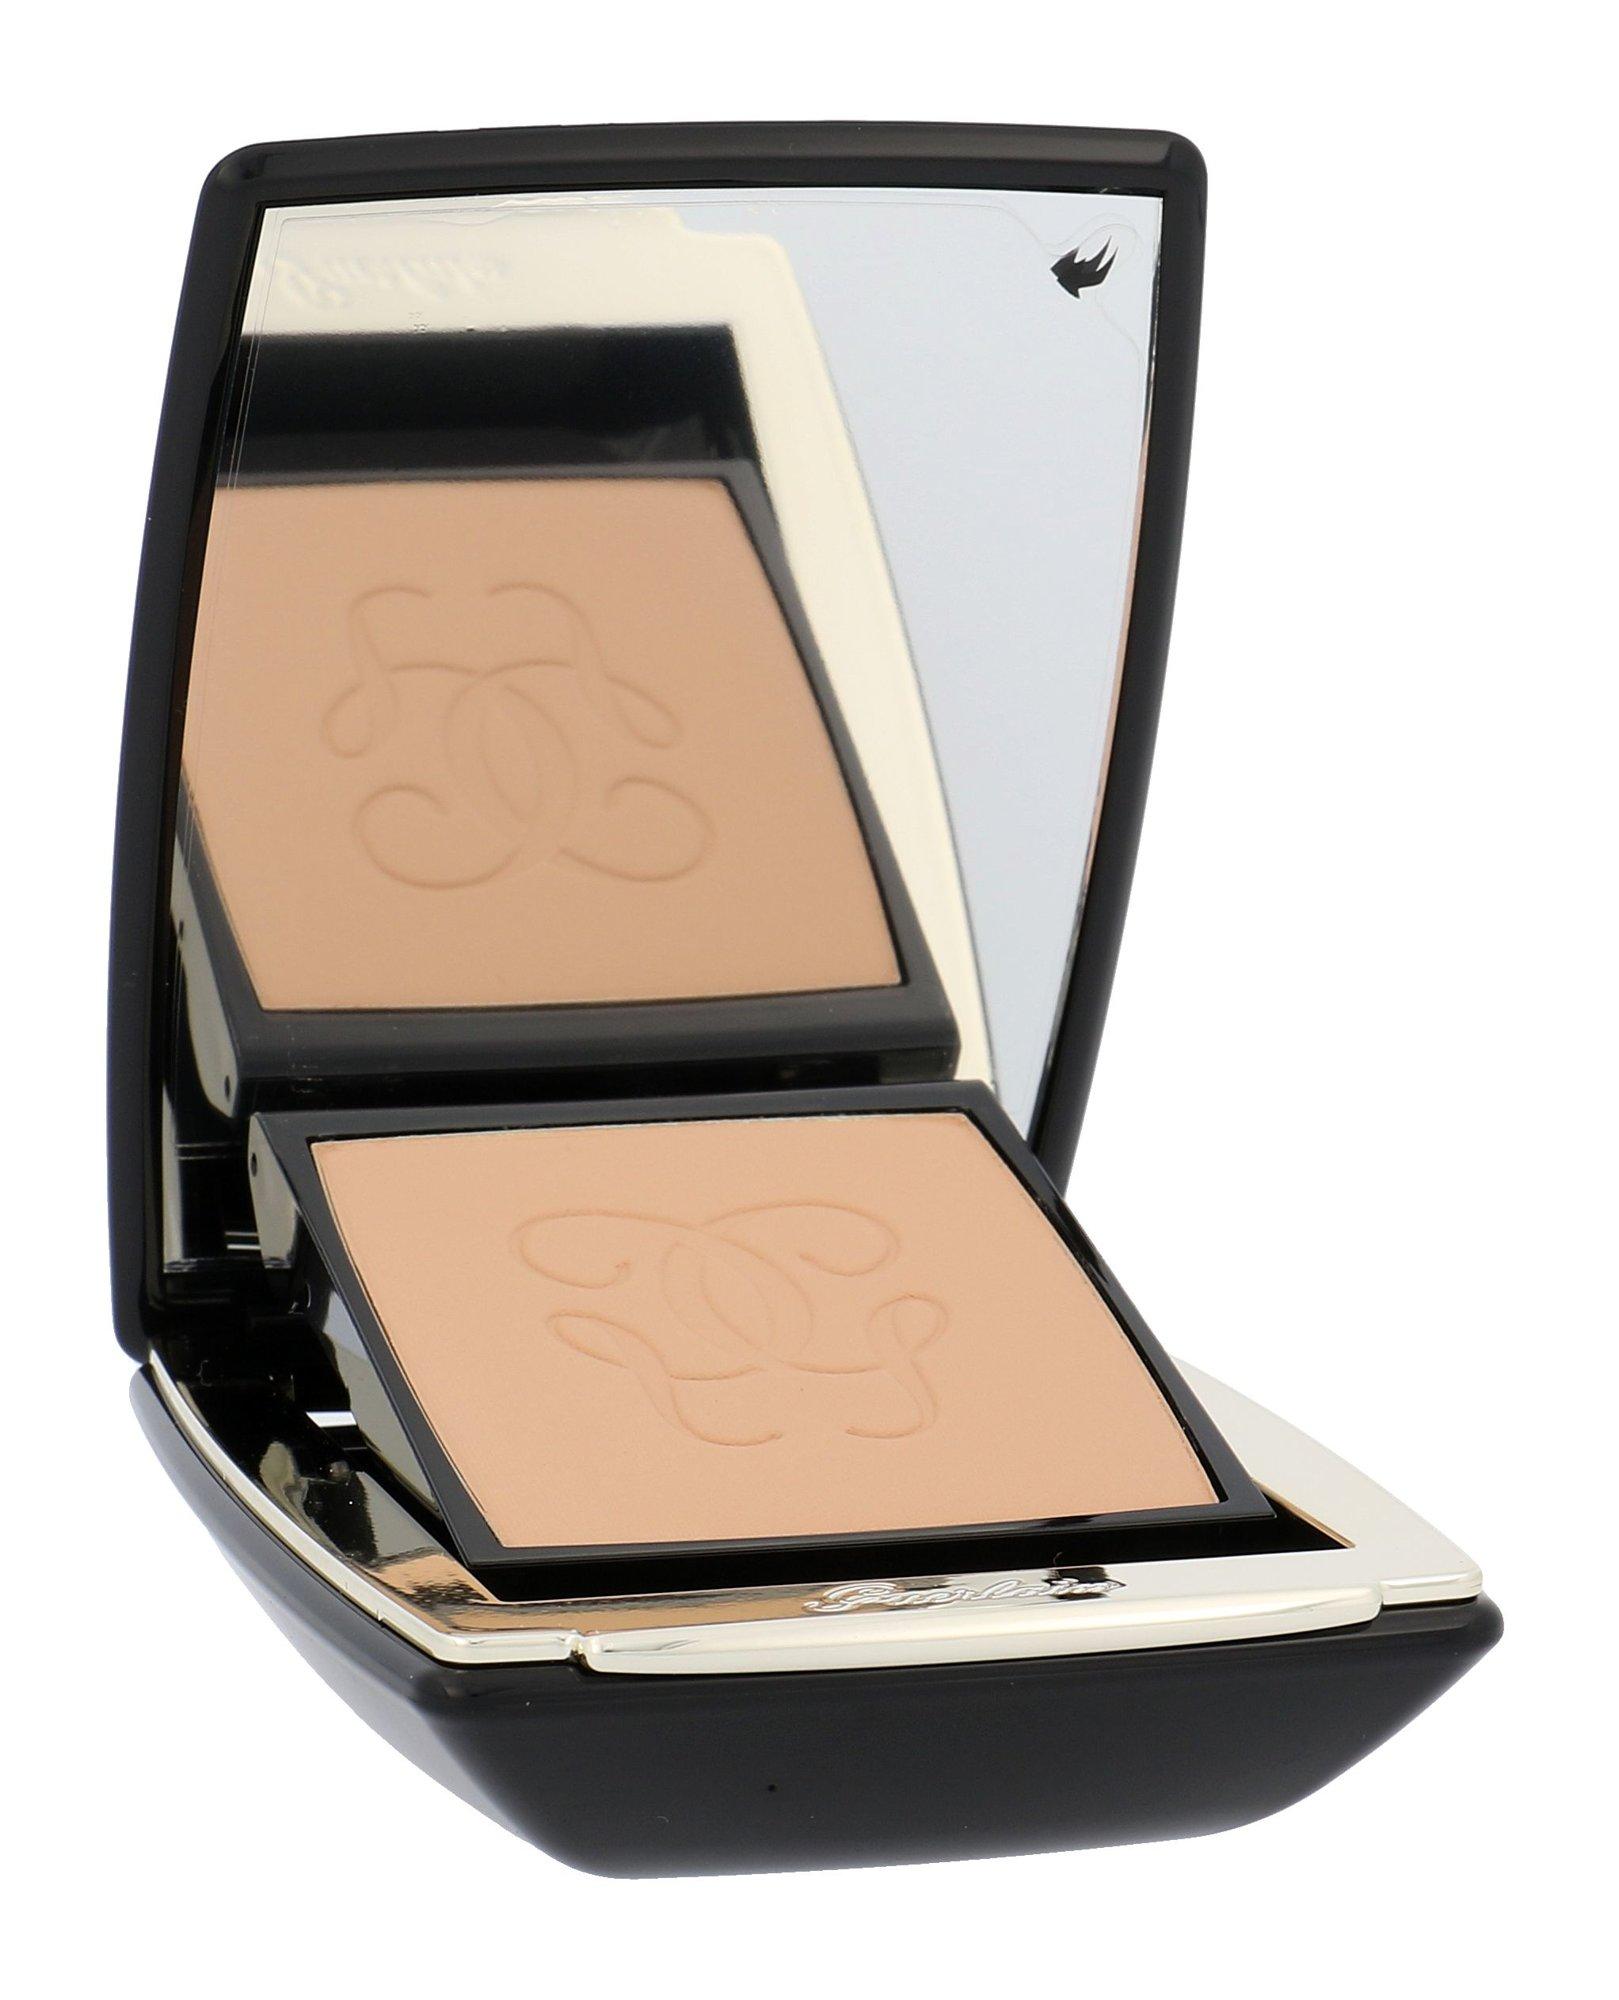 Guerlain Parure Gold Cosmetic 10ml 03 Natural Beige